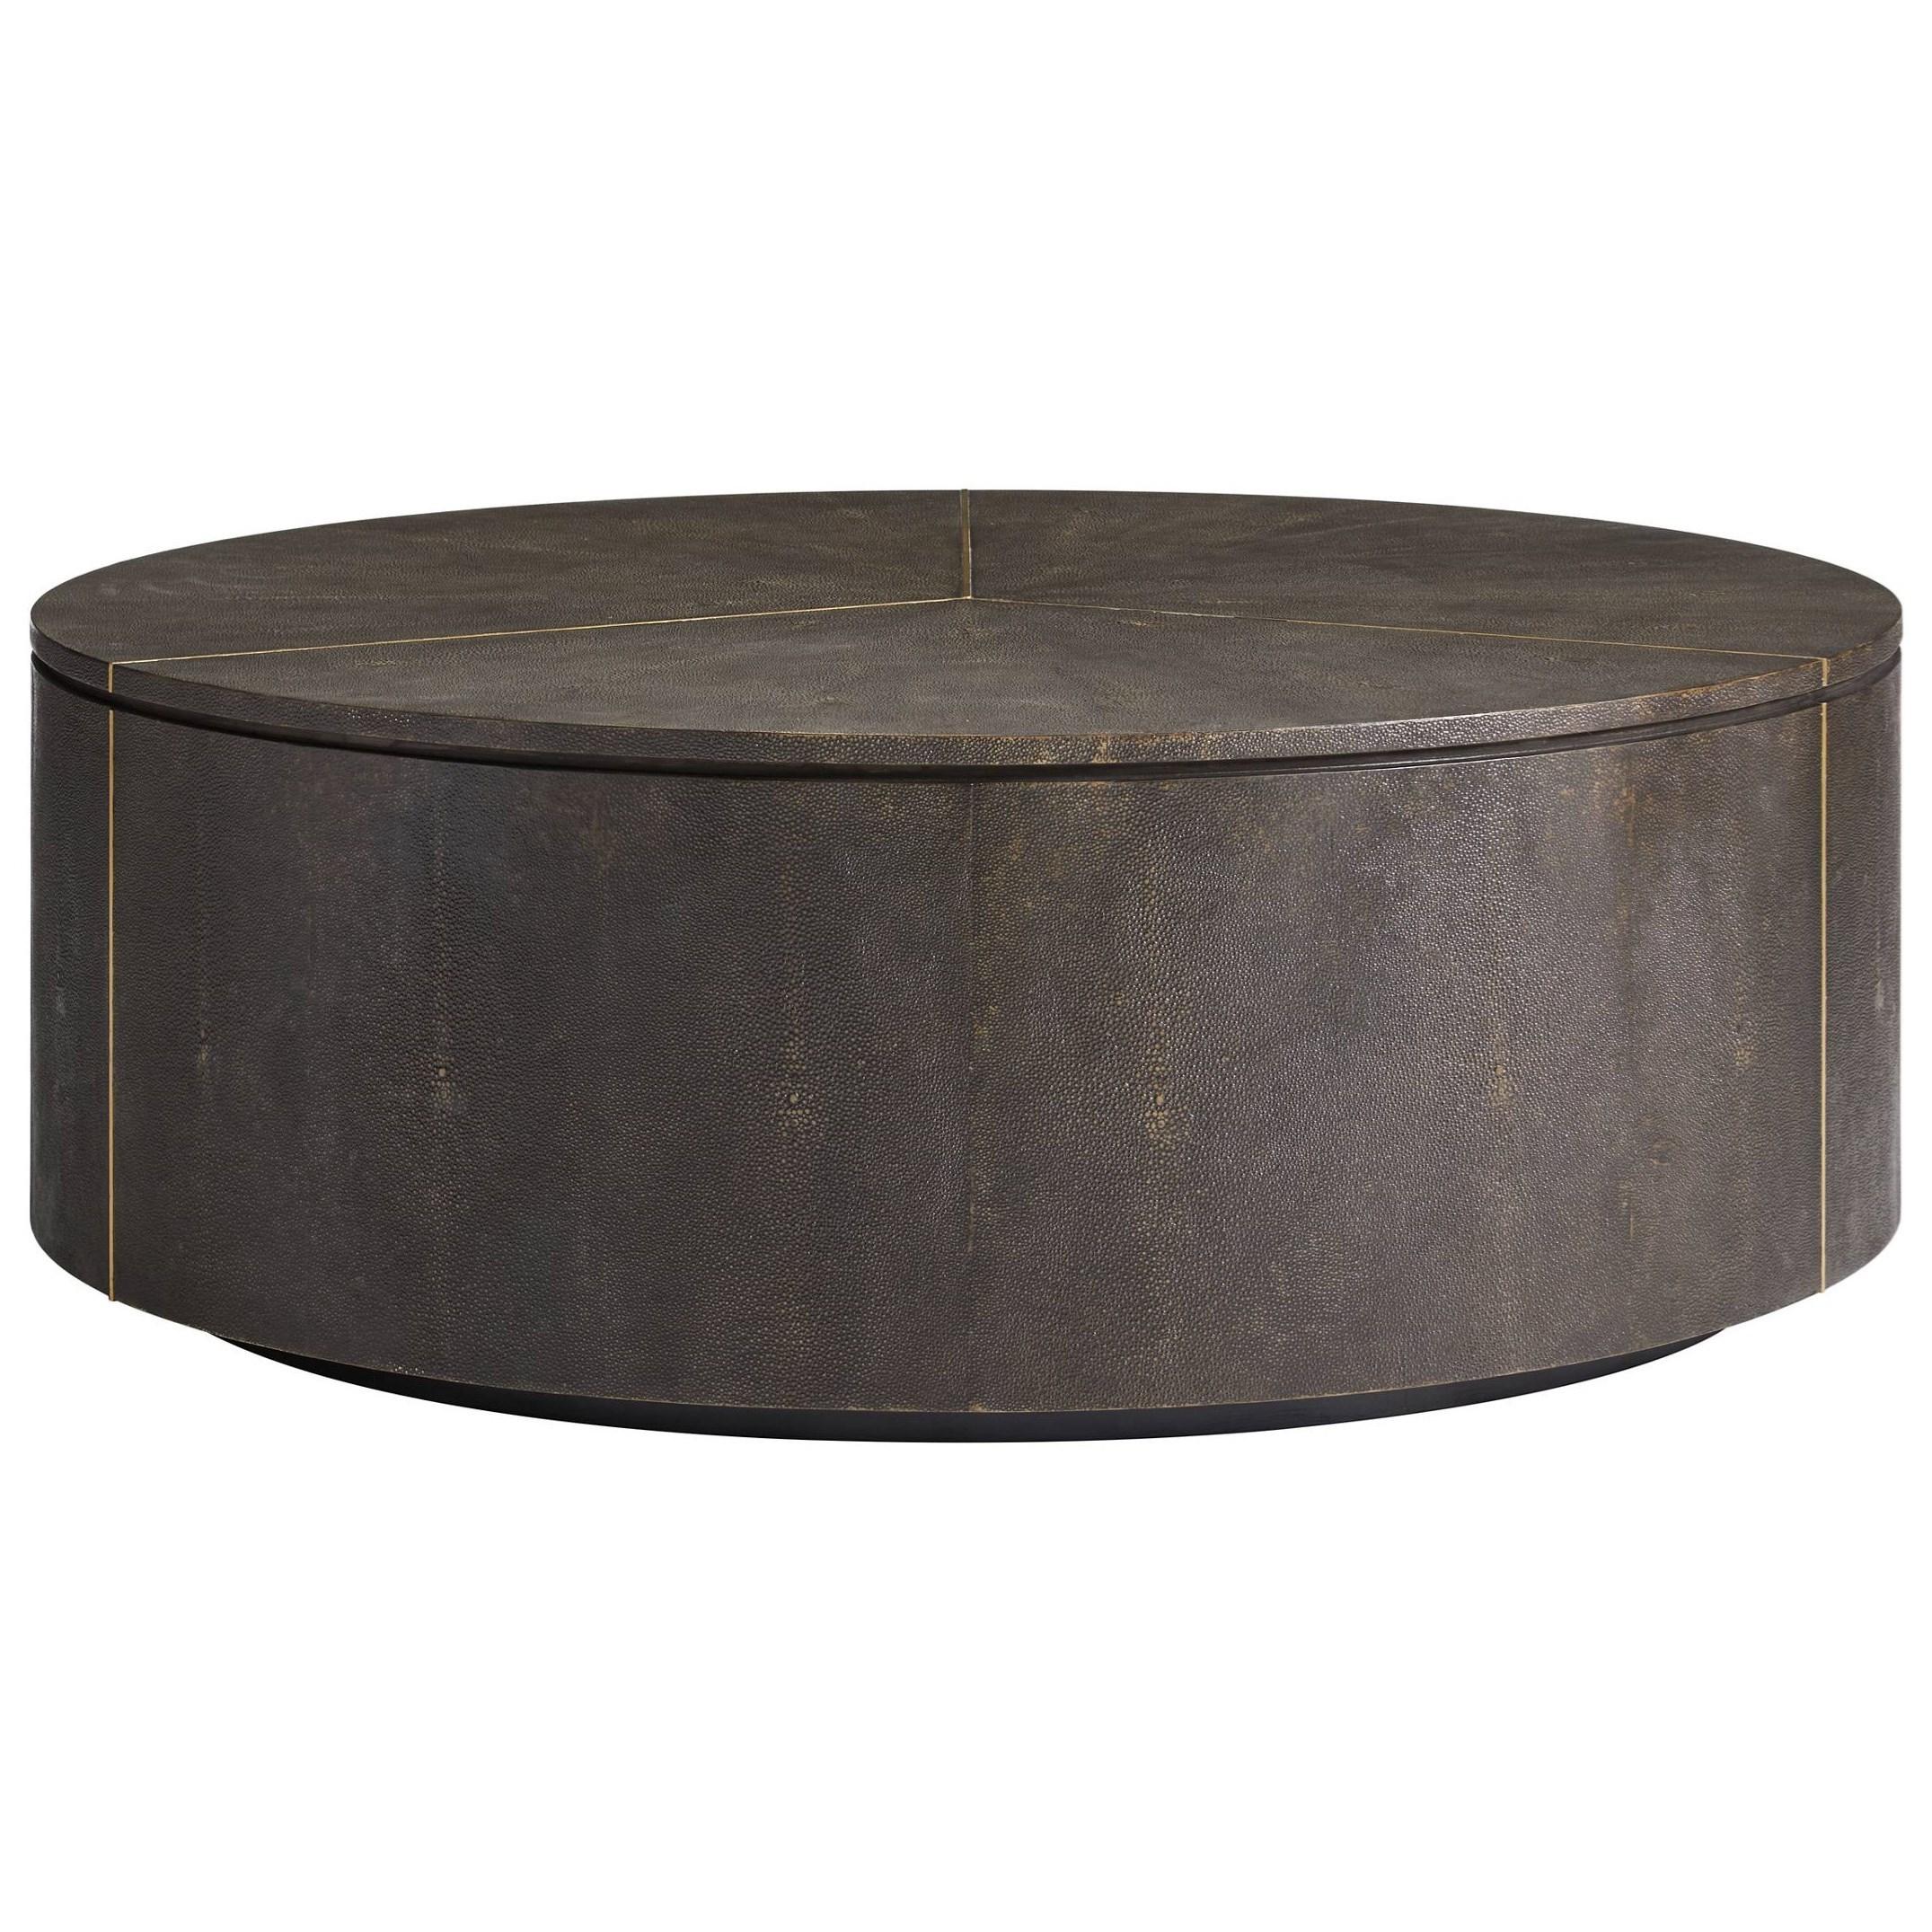 Stanley Furniture PanavistaSundial Cocktail Table ...